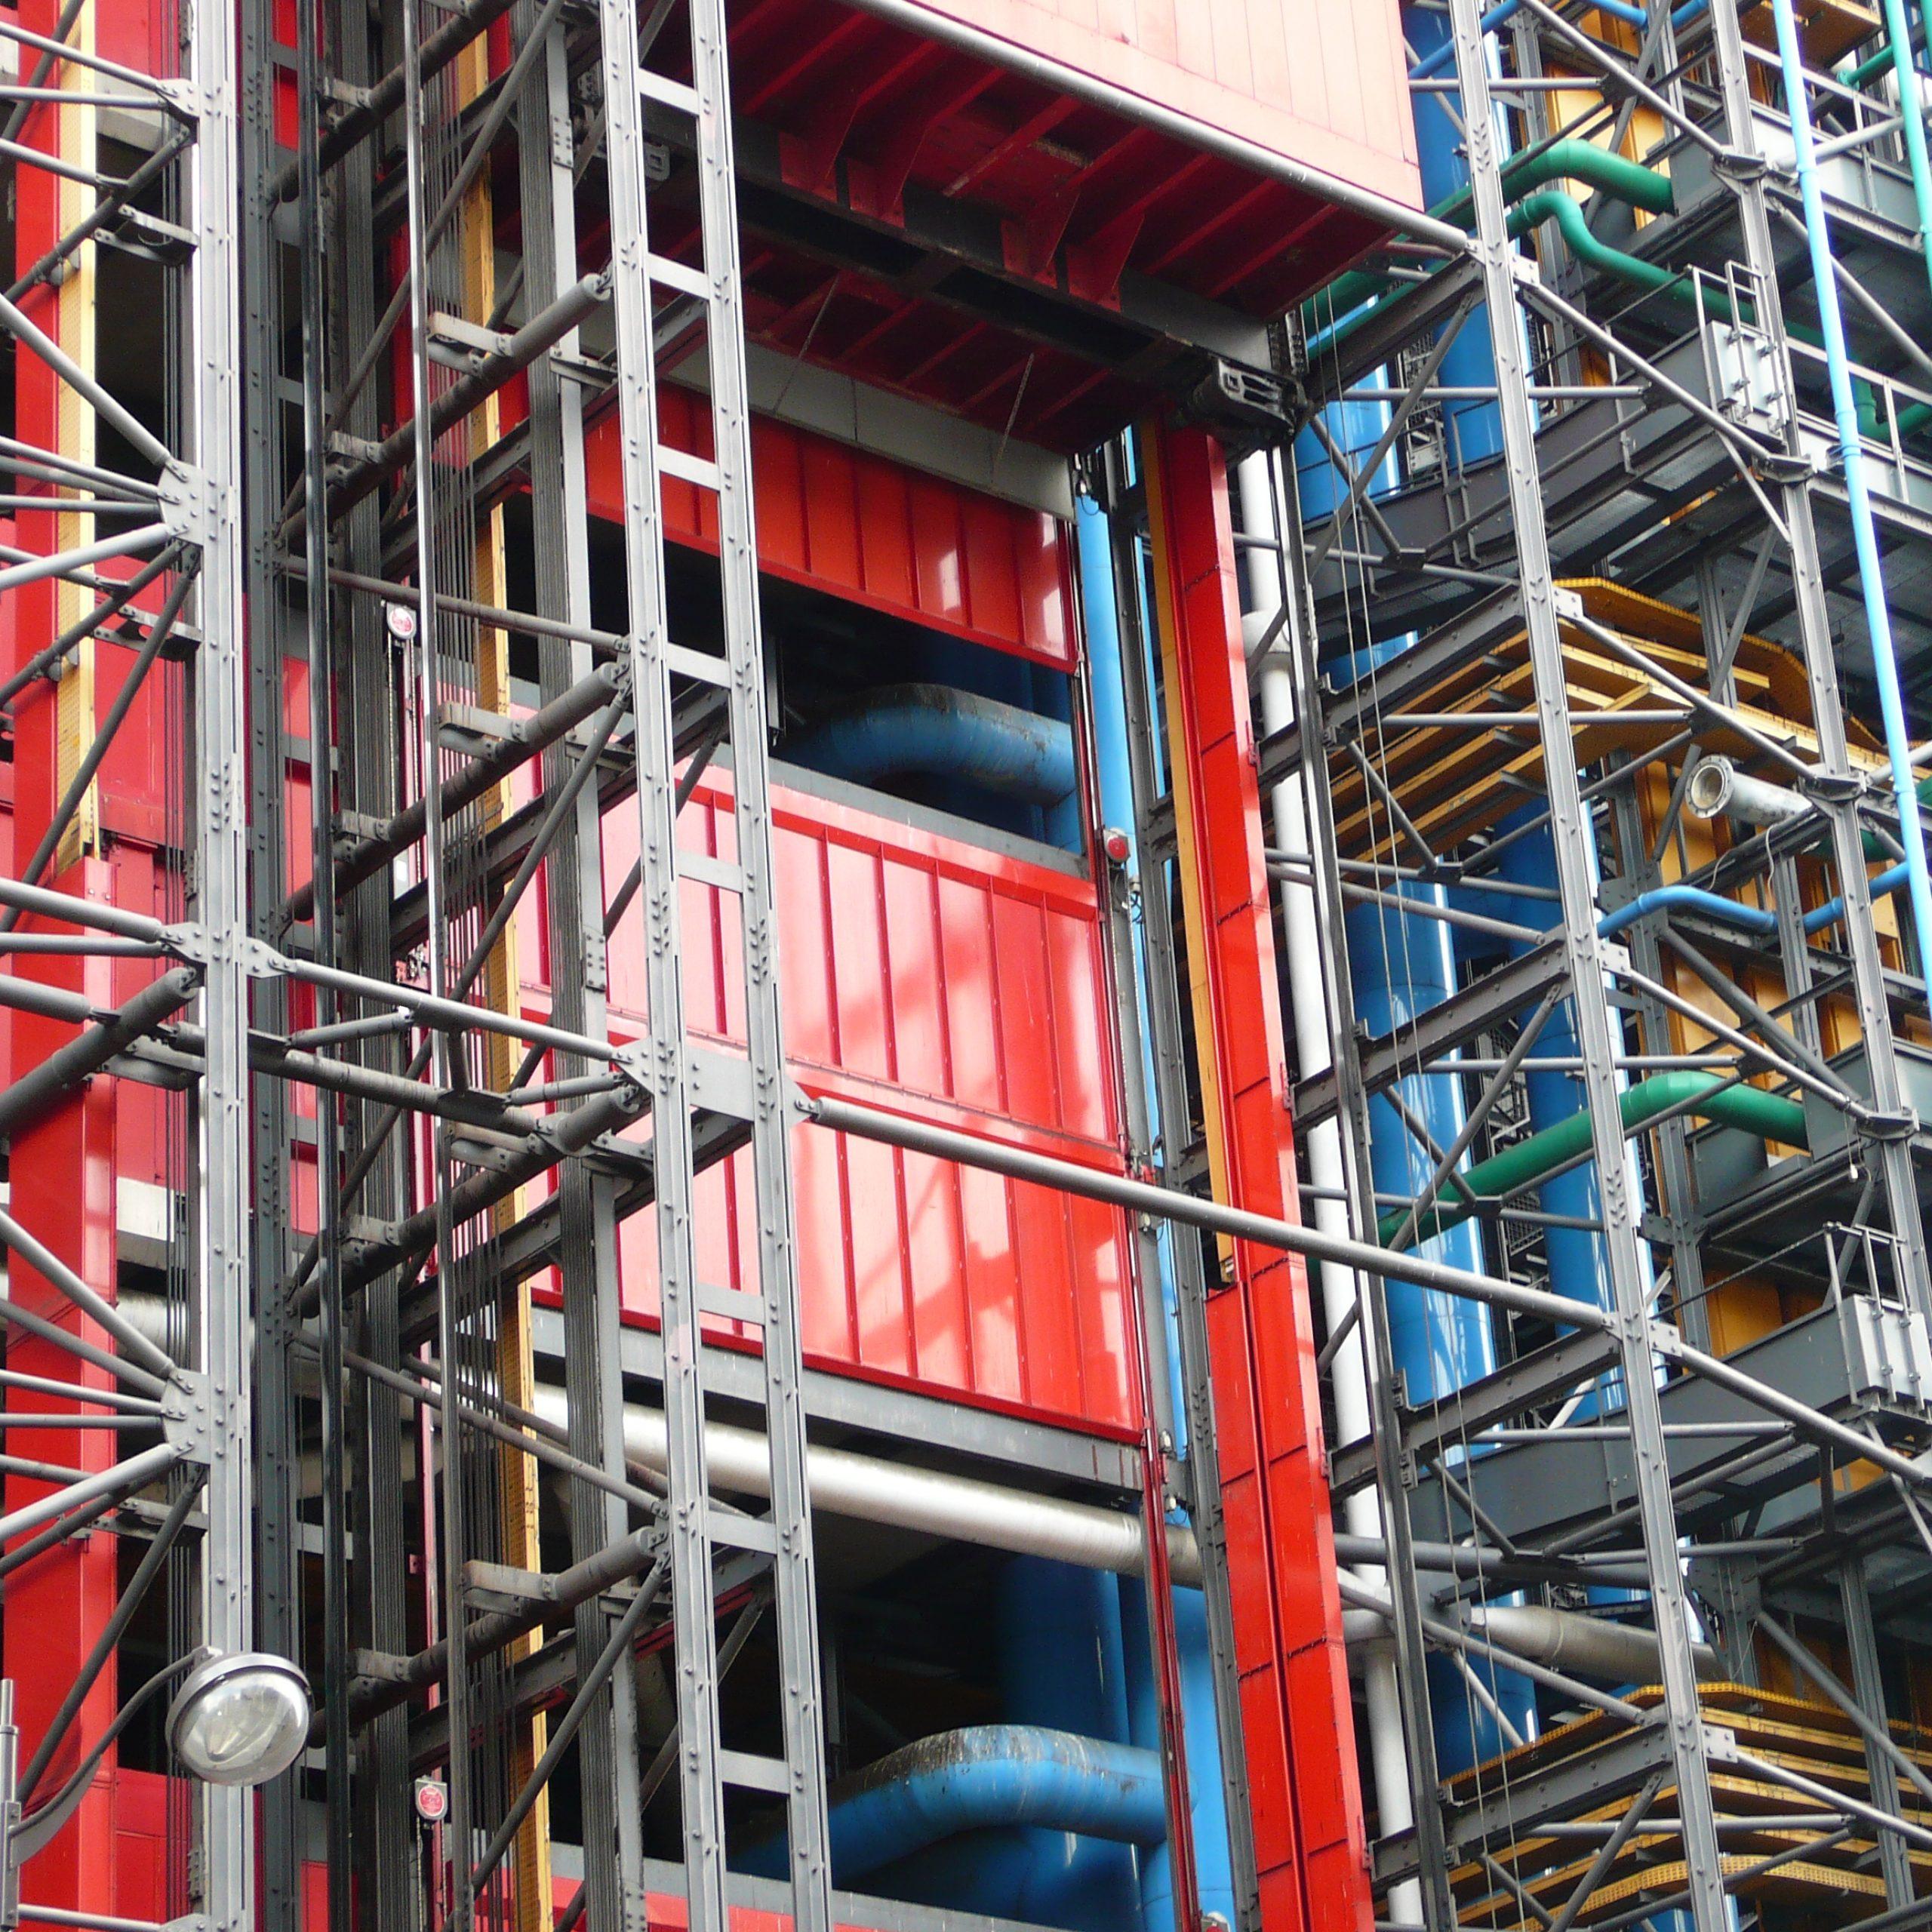 George Pompidou Center, París. HIGH-TECH ARCHITECTURE